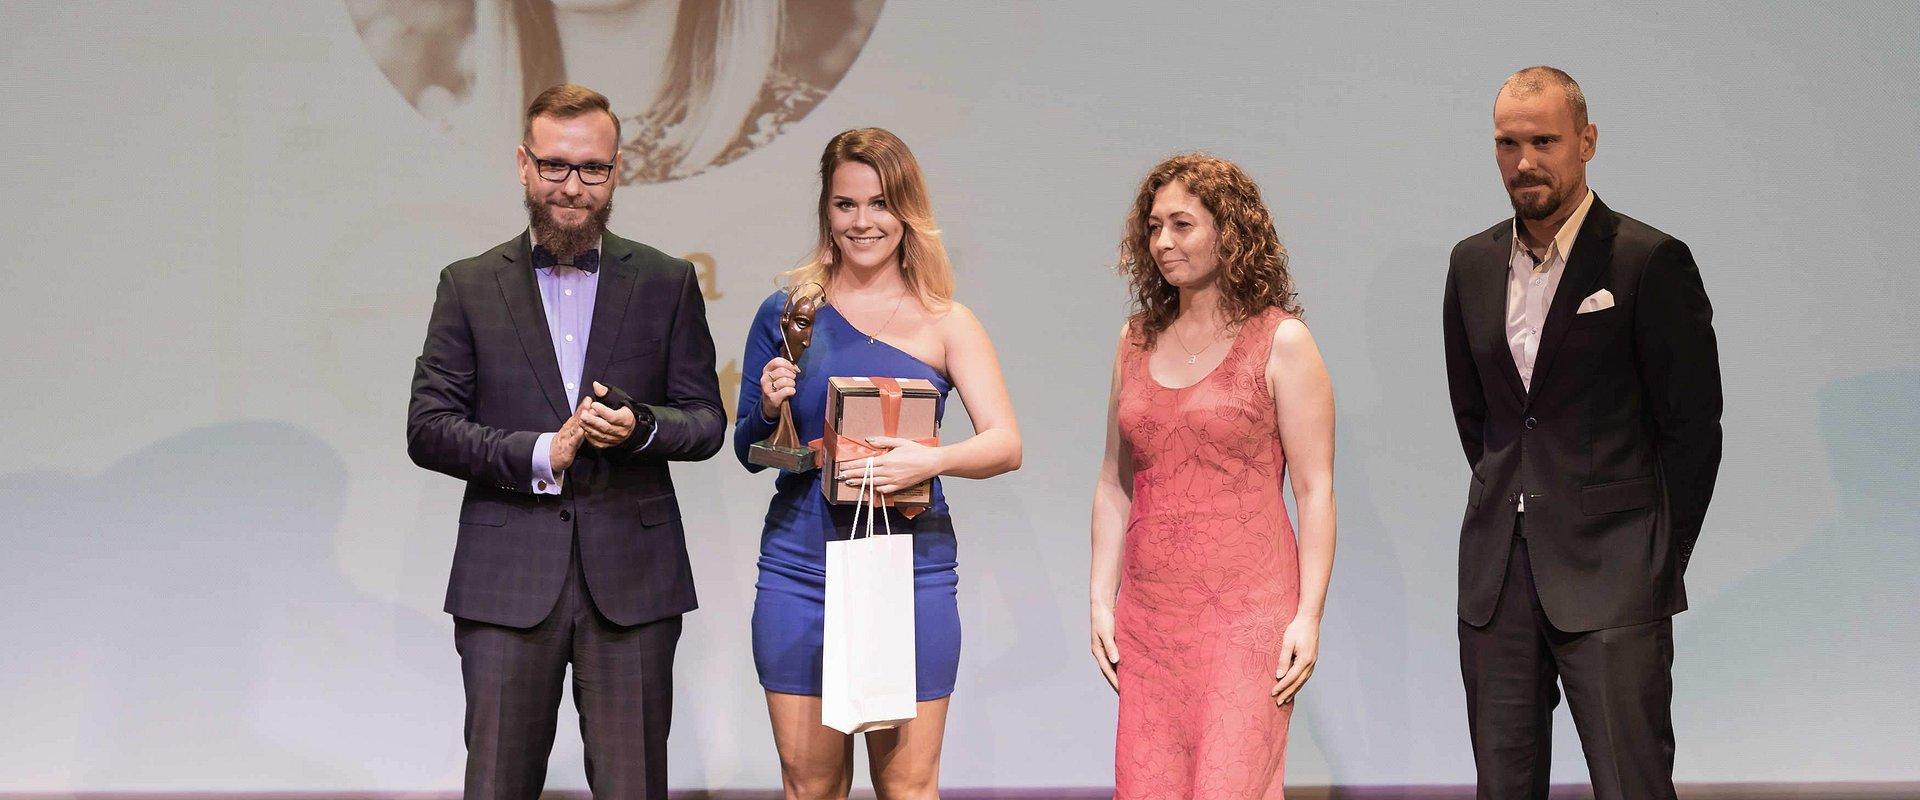 Anna Gniot z UPC Polska z tytułem Telemarketera Roku 2019!